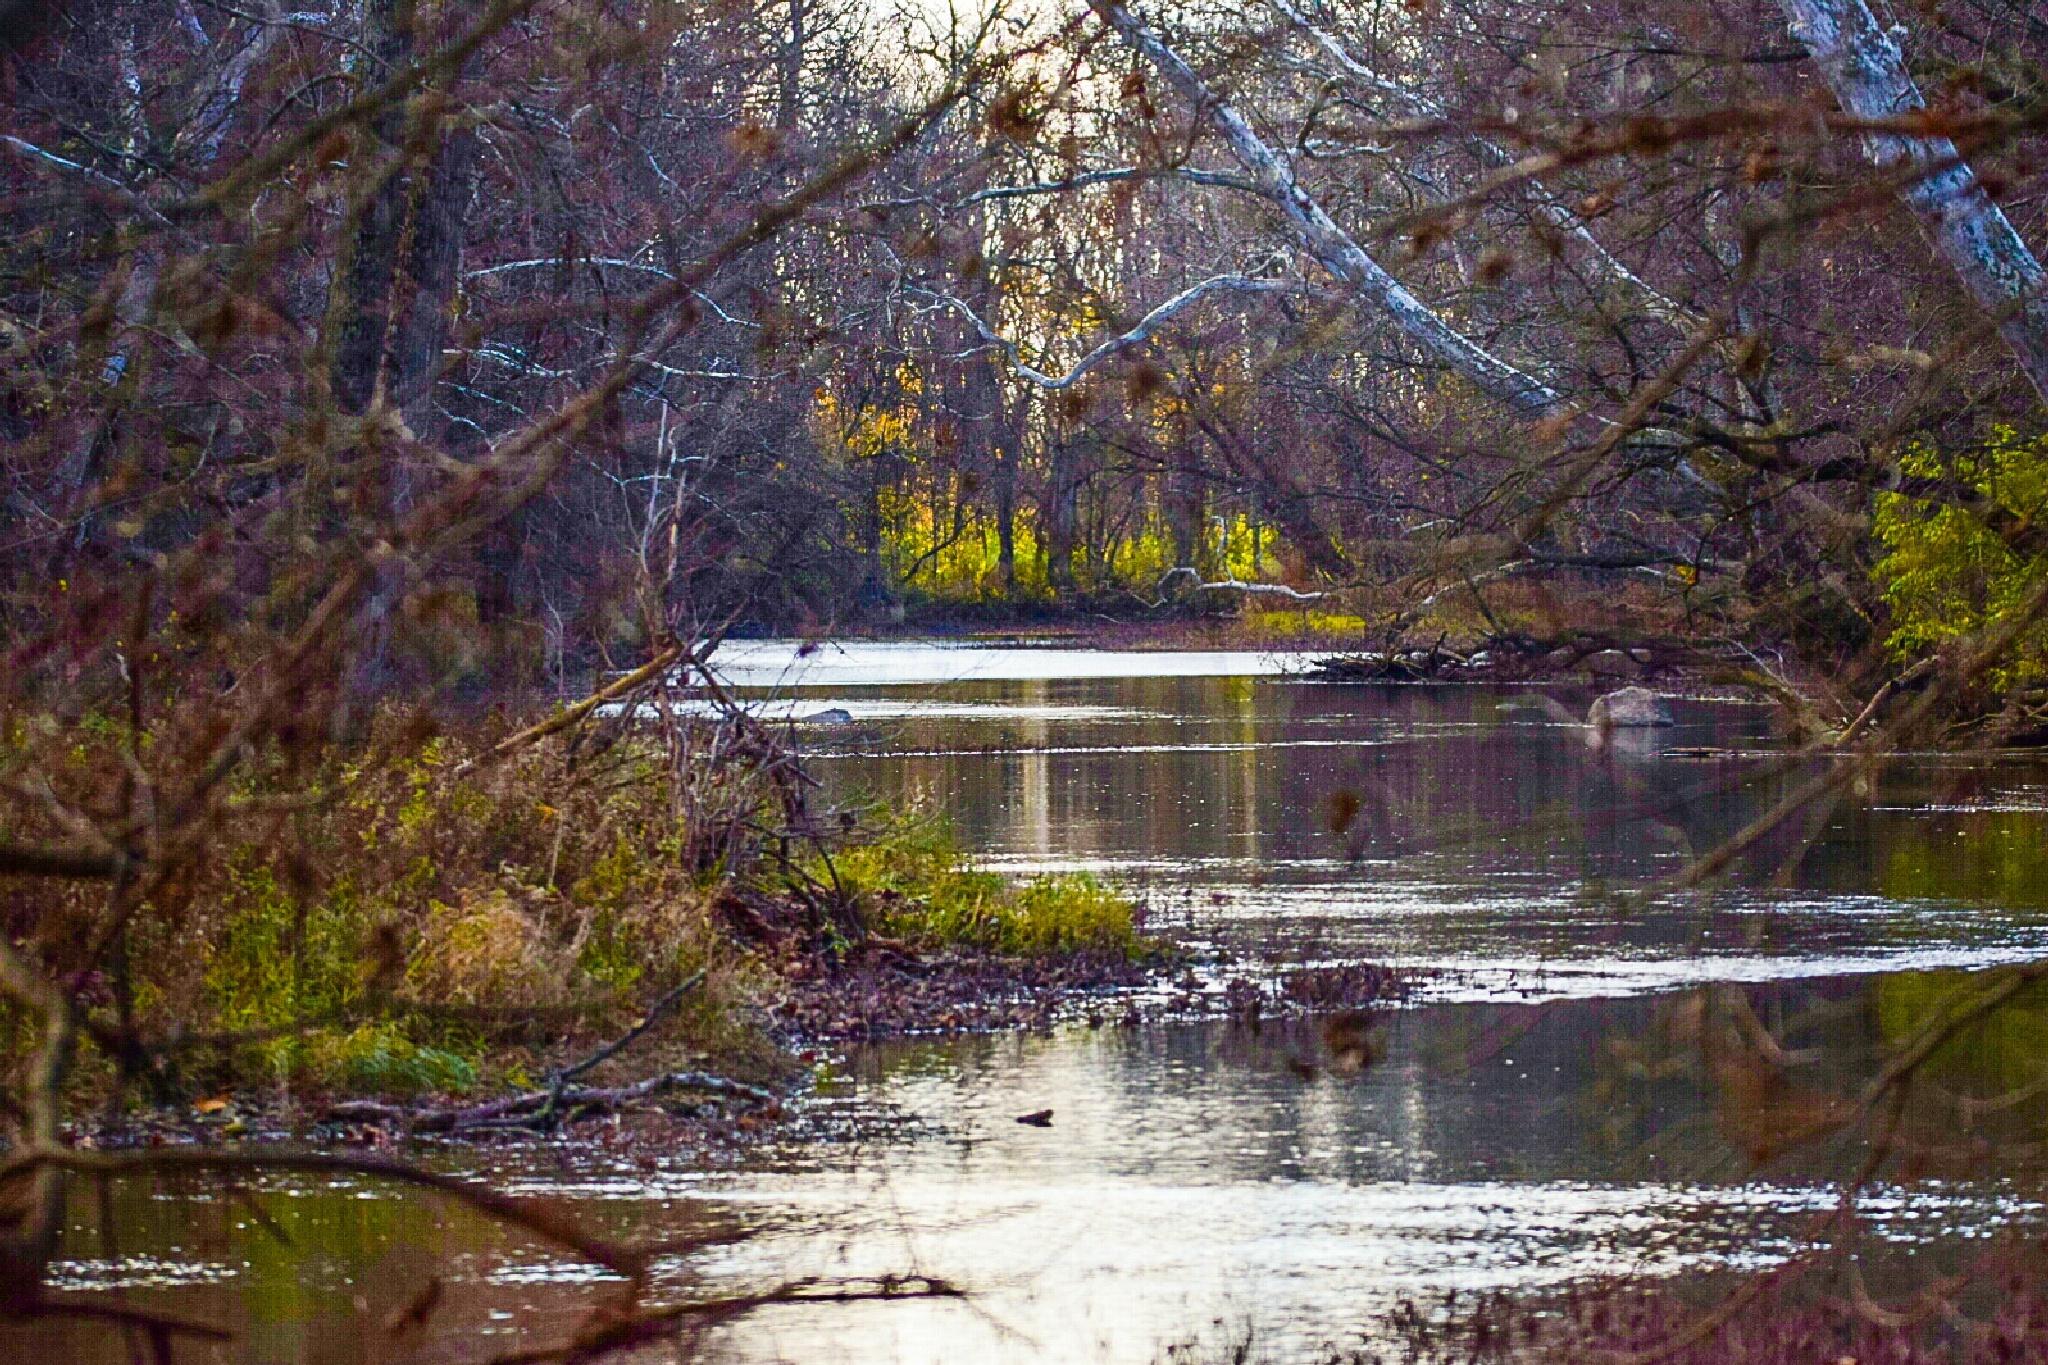 Darby Creek by Tom Kitchen